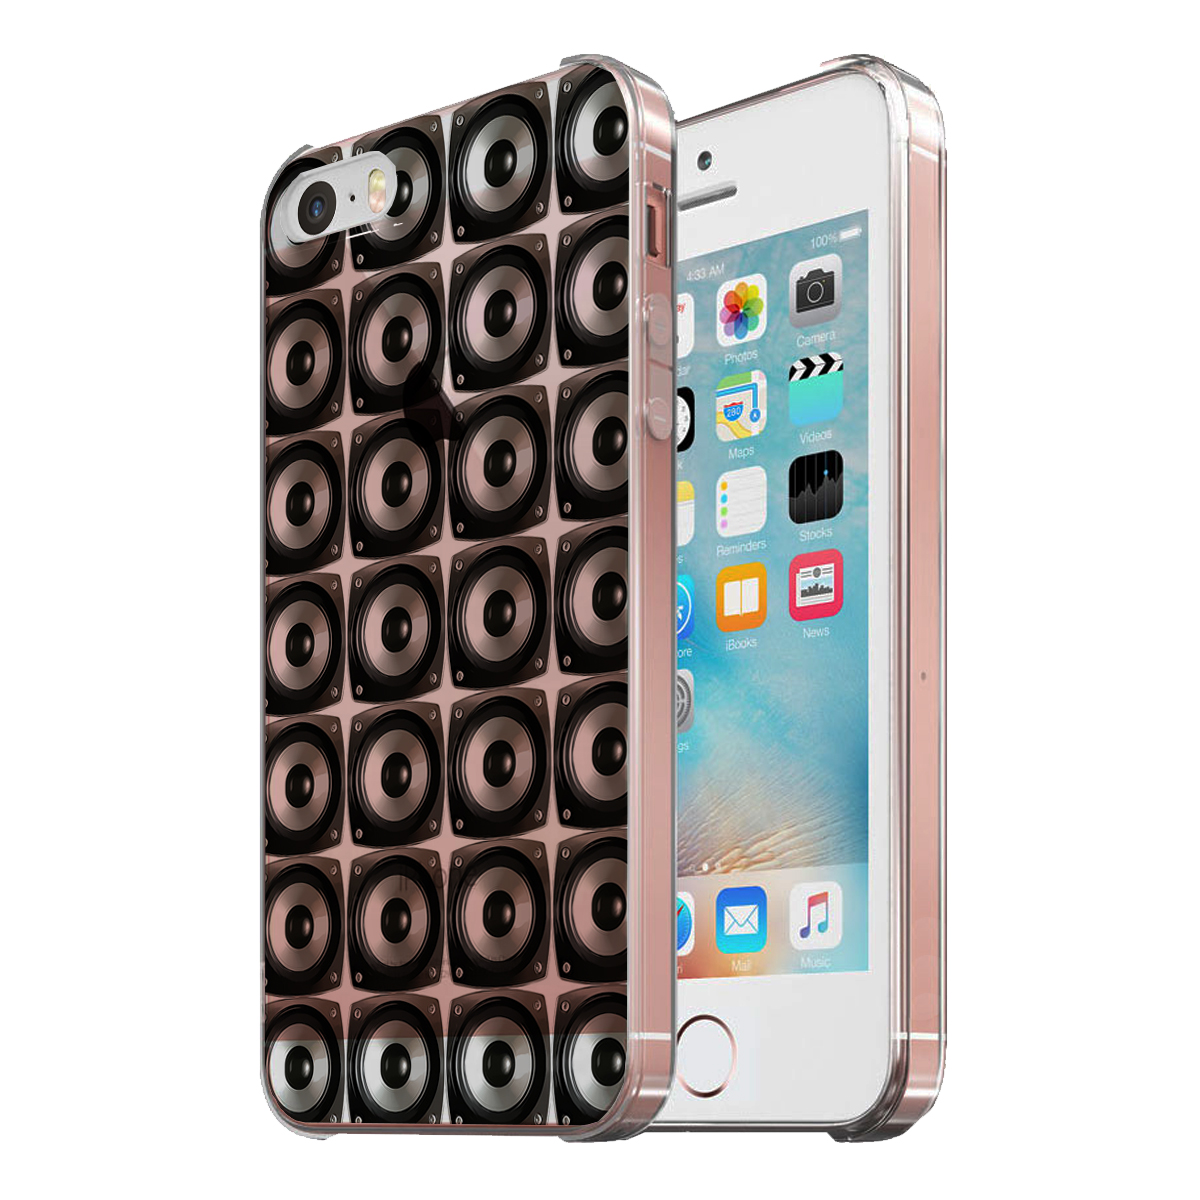 KuzmarK Clear Cover Case fits iPhone SE & iPhone 5 - Speaker Speakers